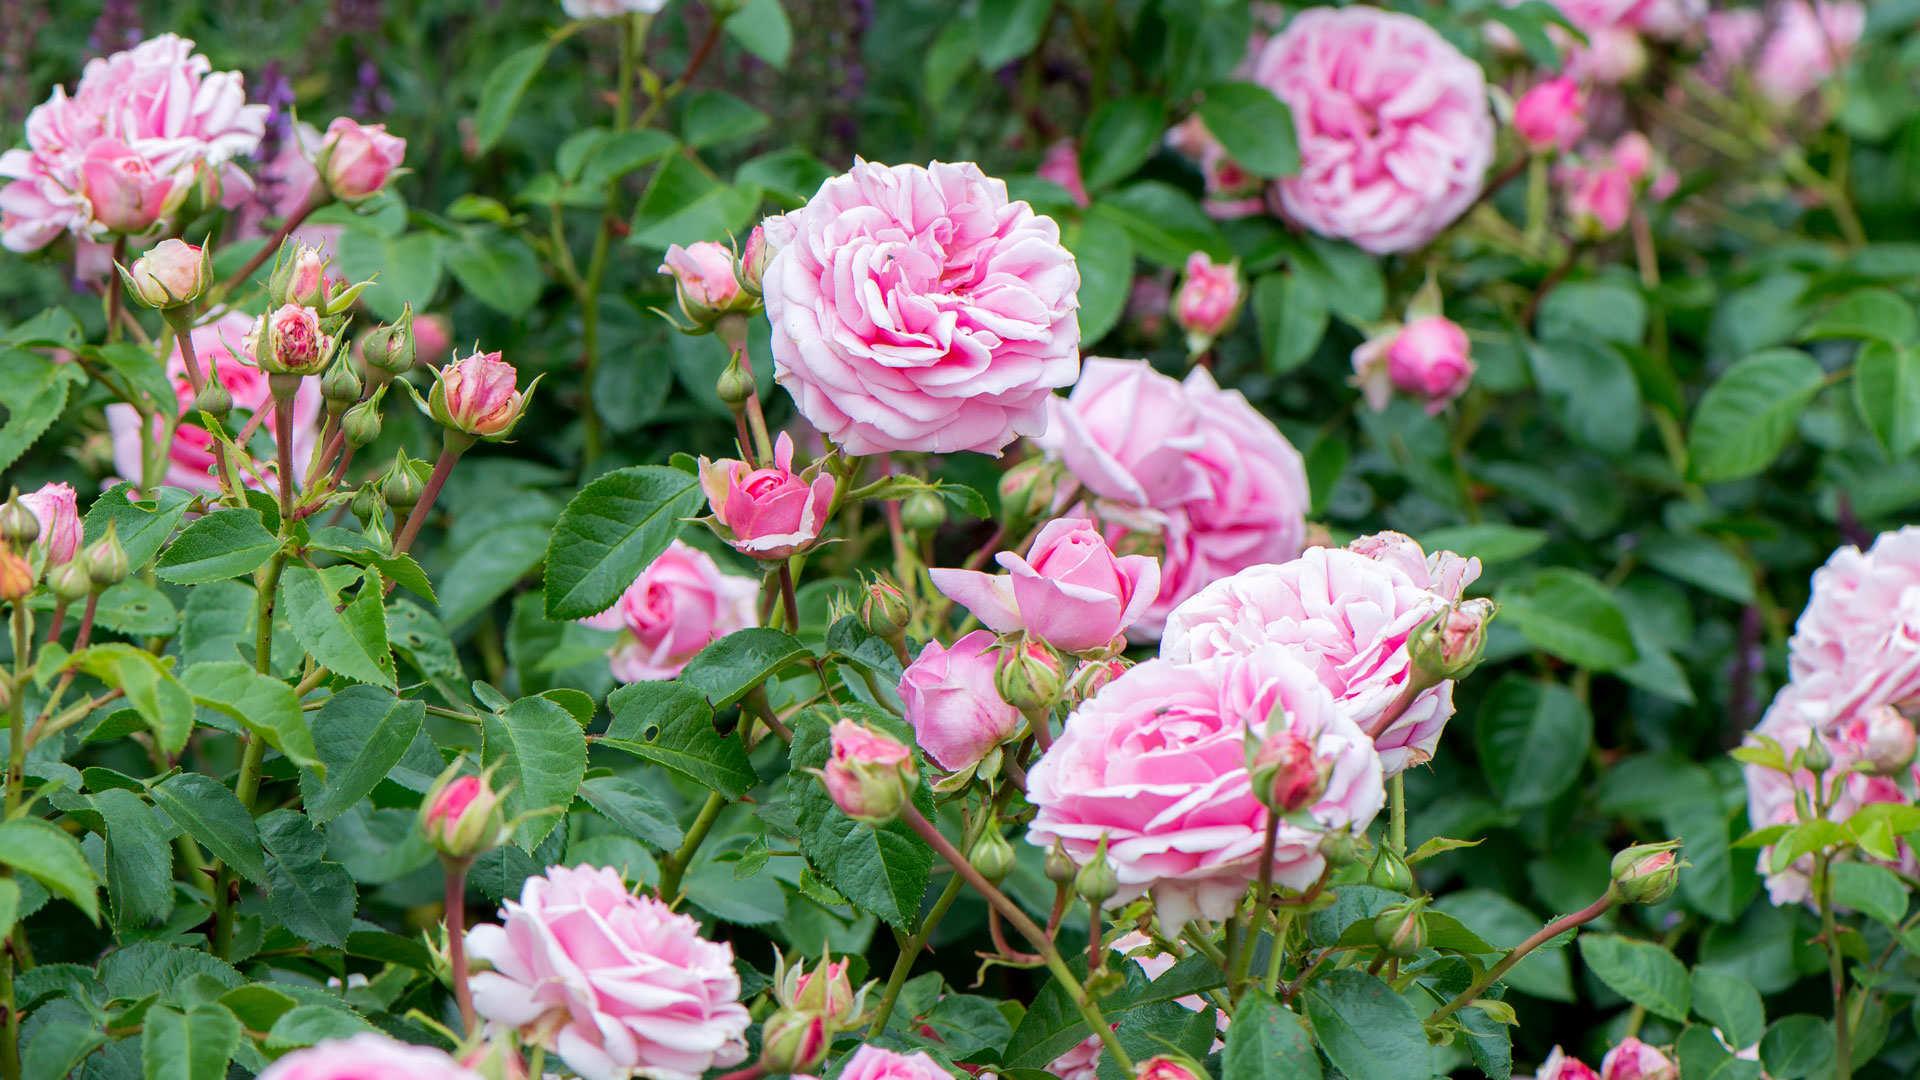 de mooiste rozen staan in jouw tuin dcm